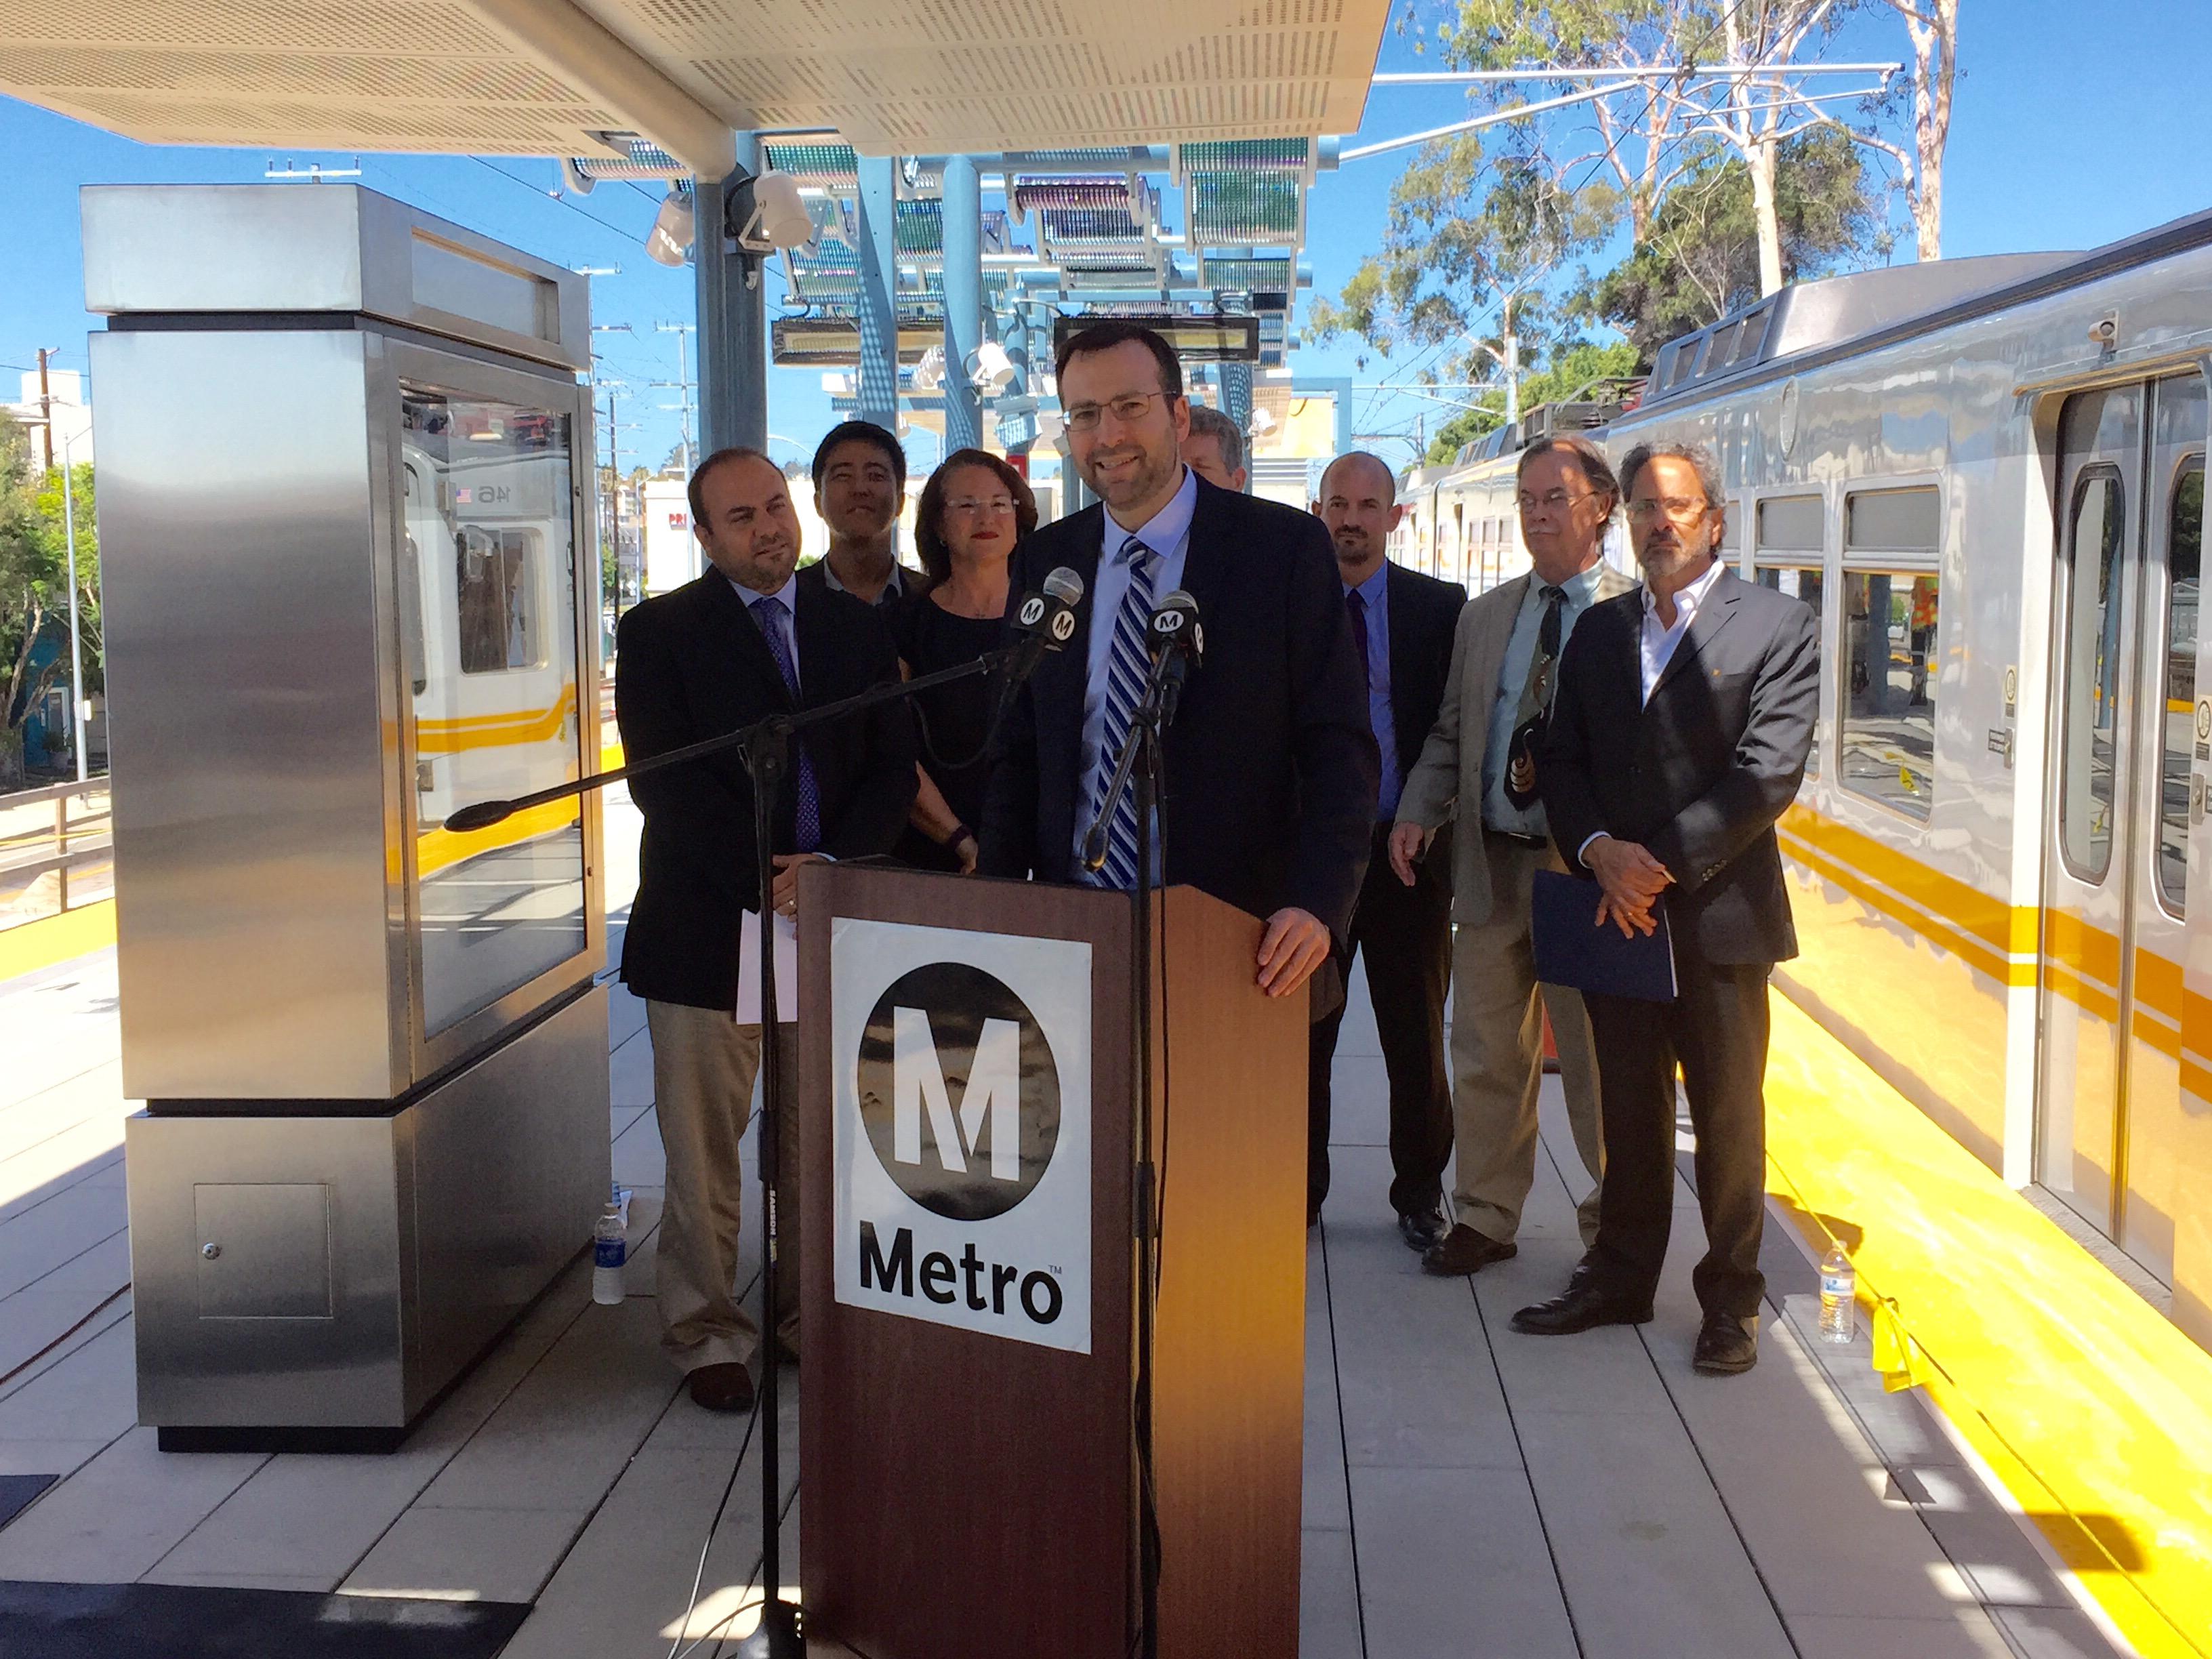 State Sen. Ben Allen speaks at this morning's press event. Photo: Dave Sotero/Metro.